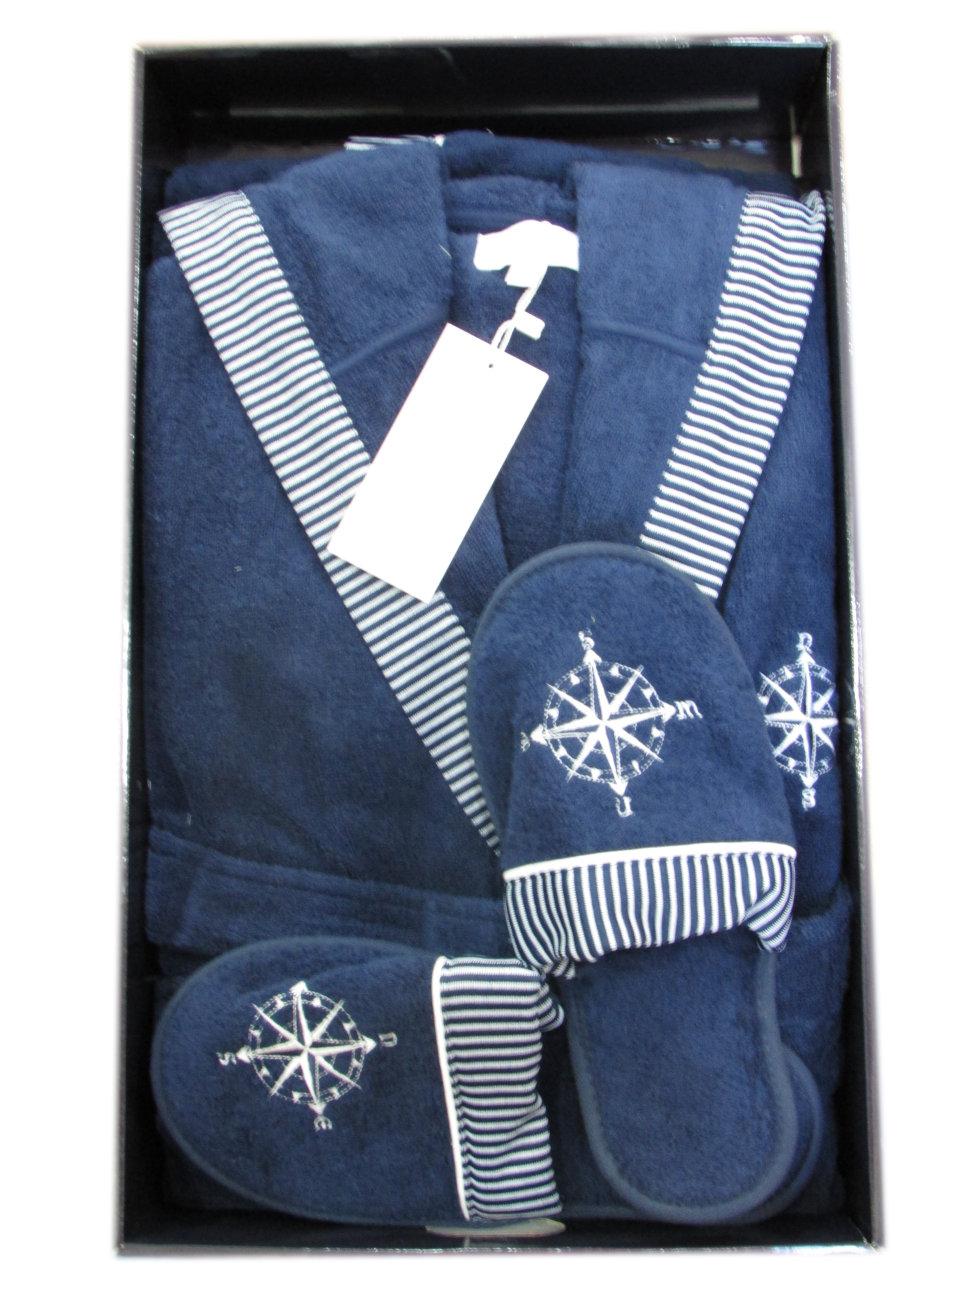 492c42dab5b6 Халат махровый Marine Maison D'or с капюшоном + тапочки синий ...